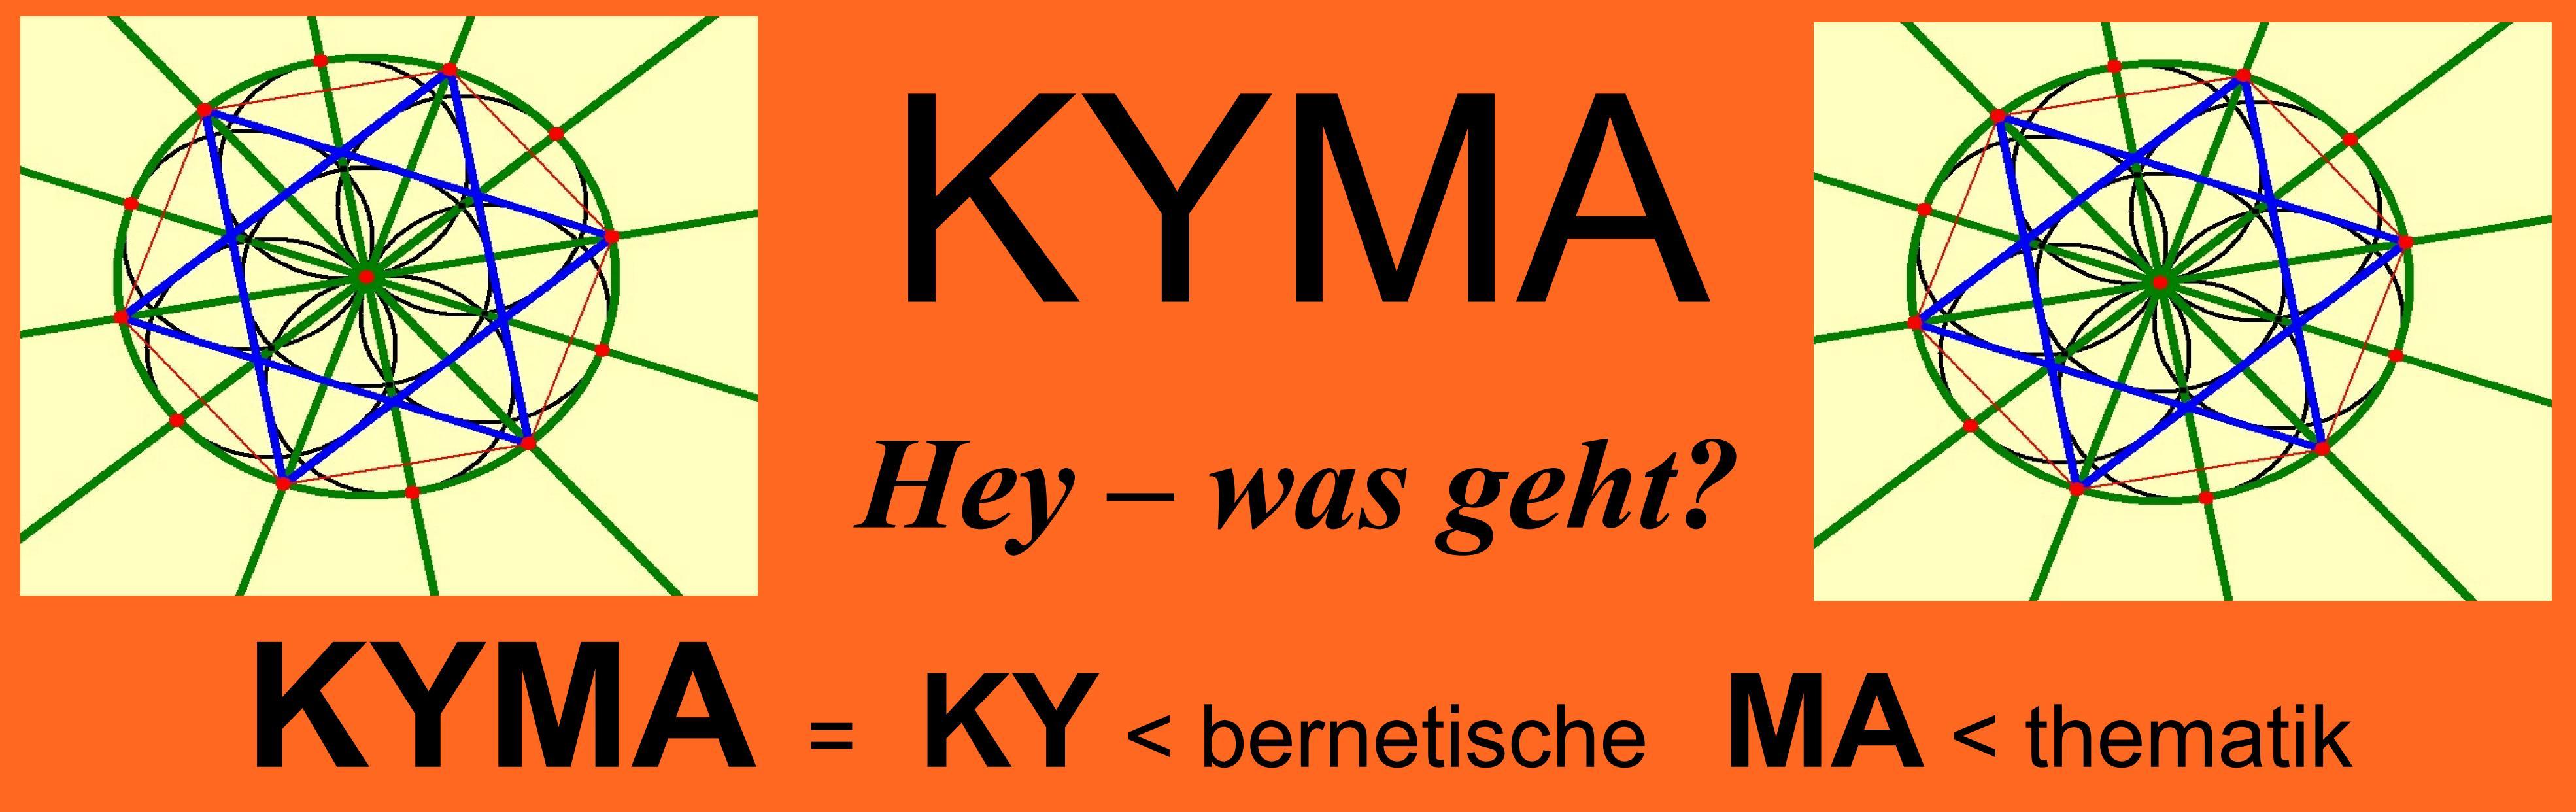 logo kyma 400.jpg